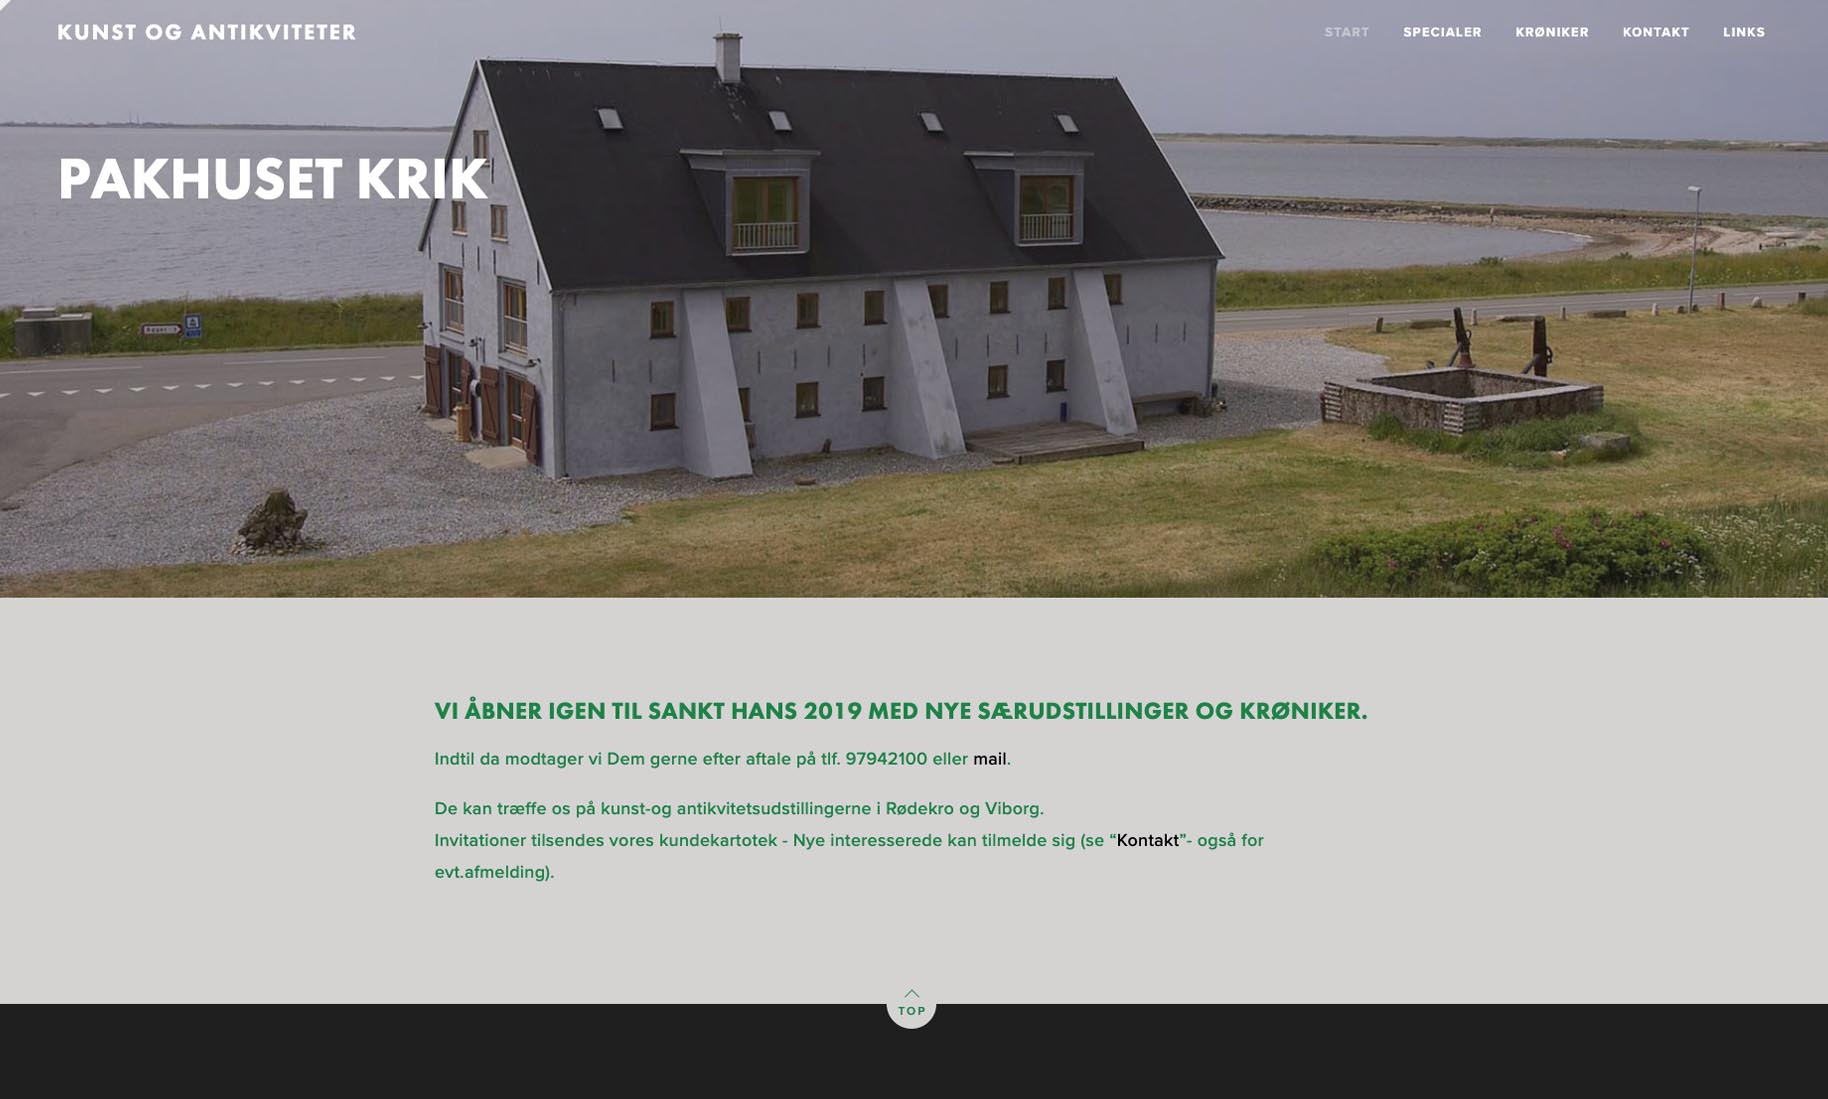 Website: Pakhuset Krik (nu udløbet)